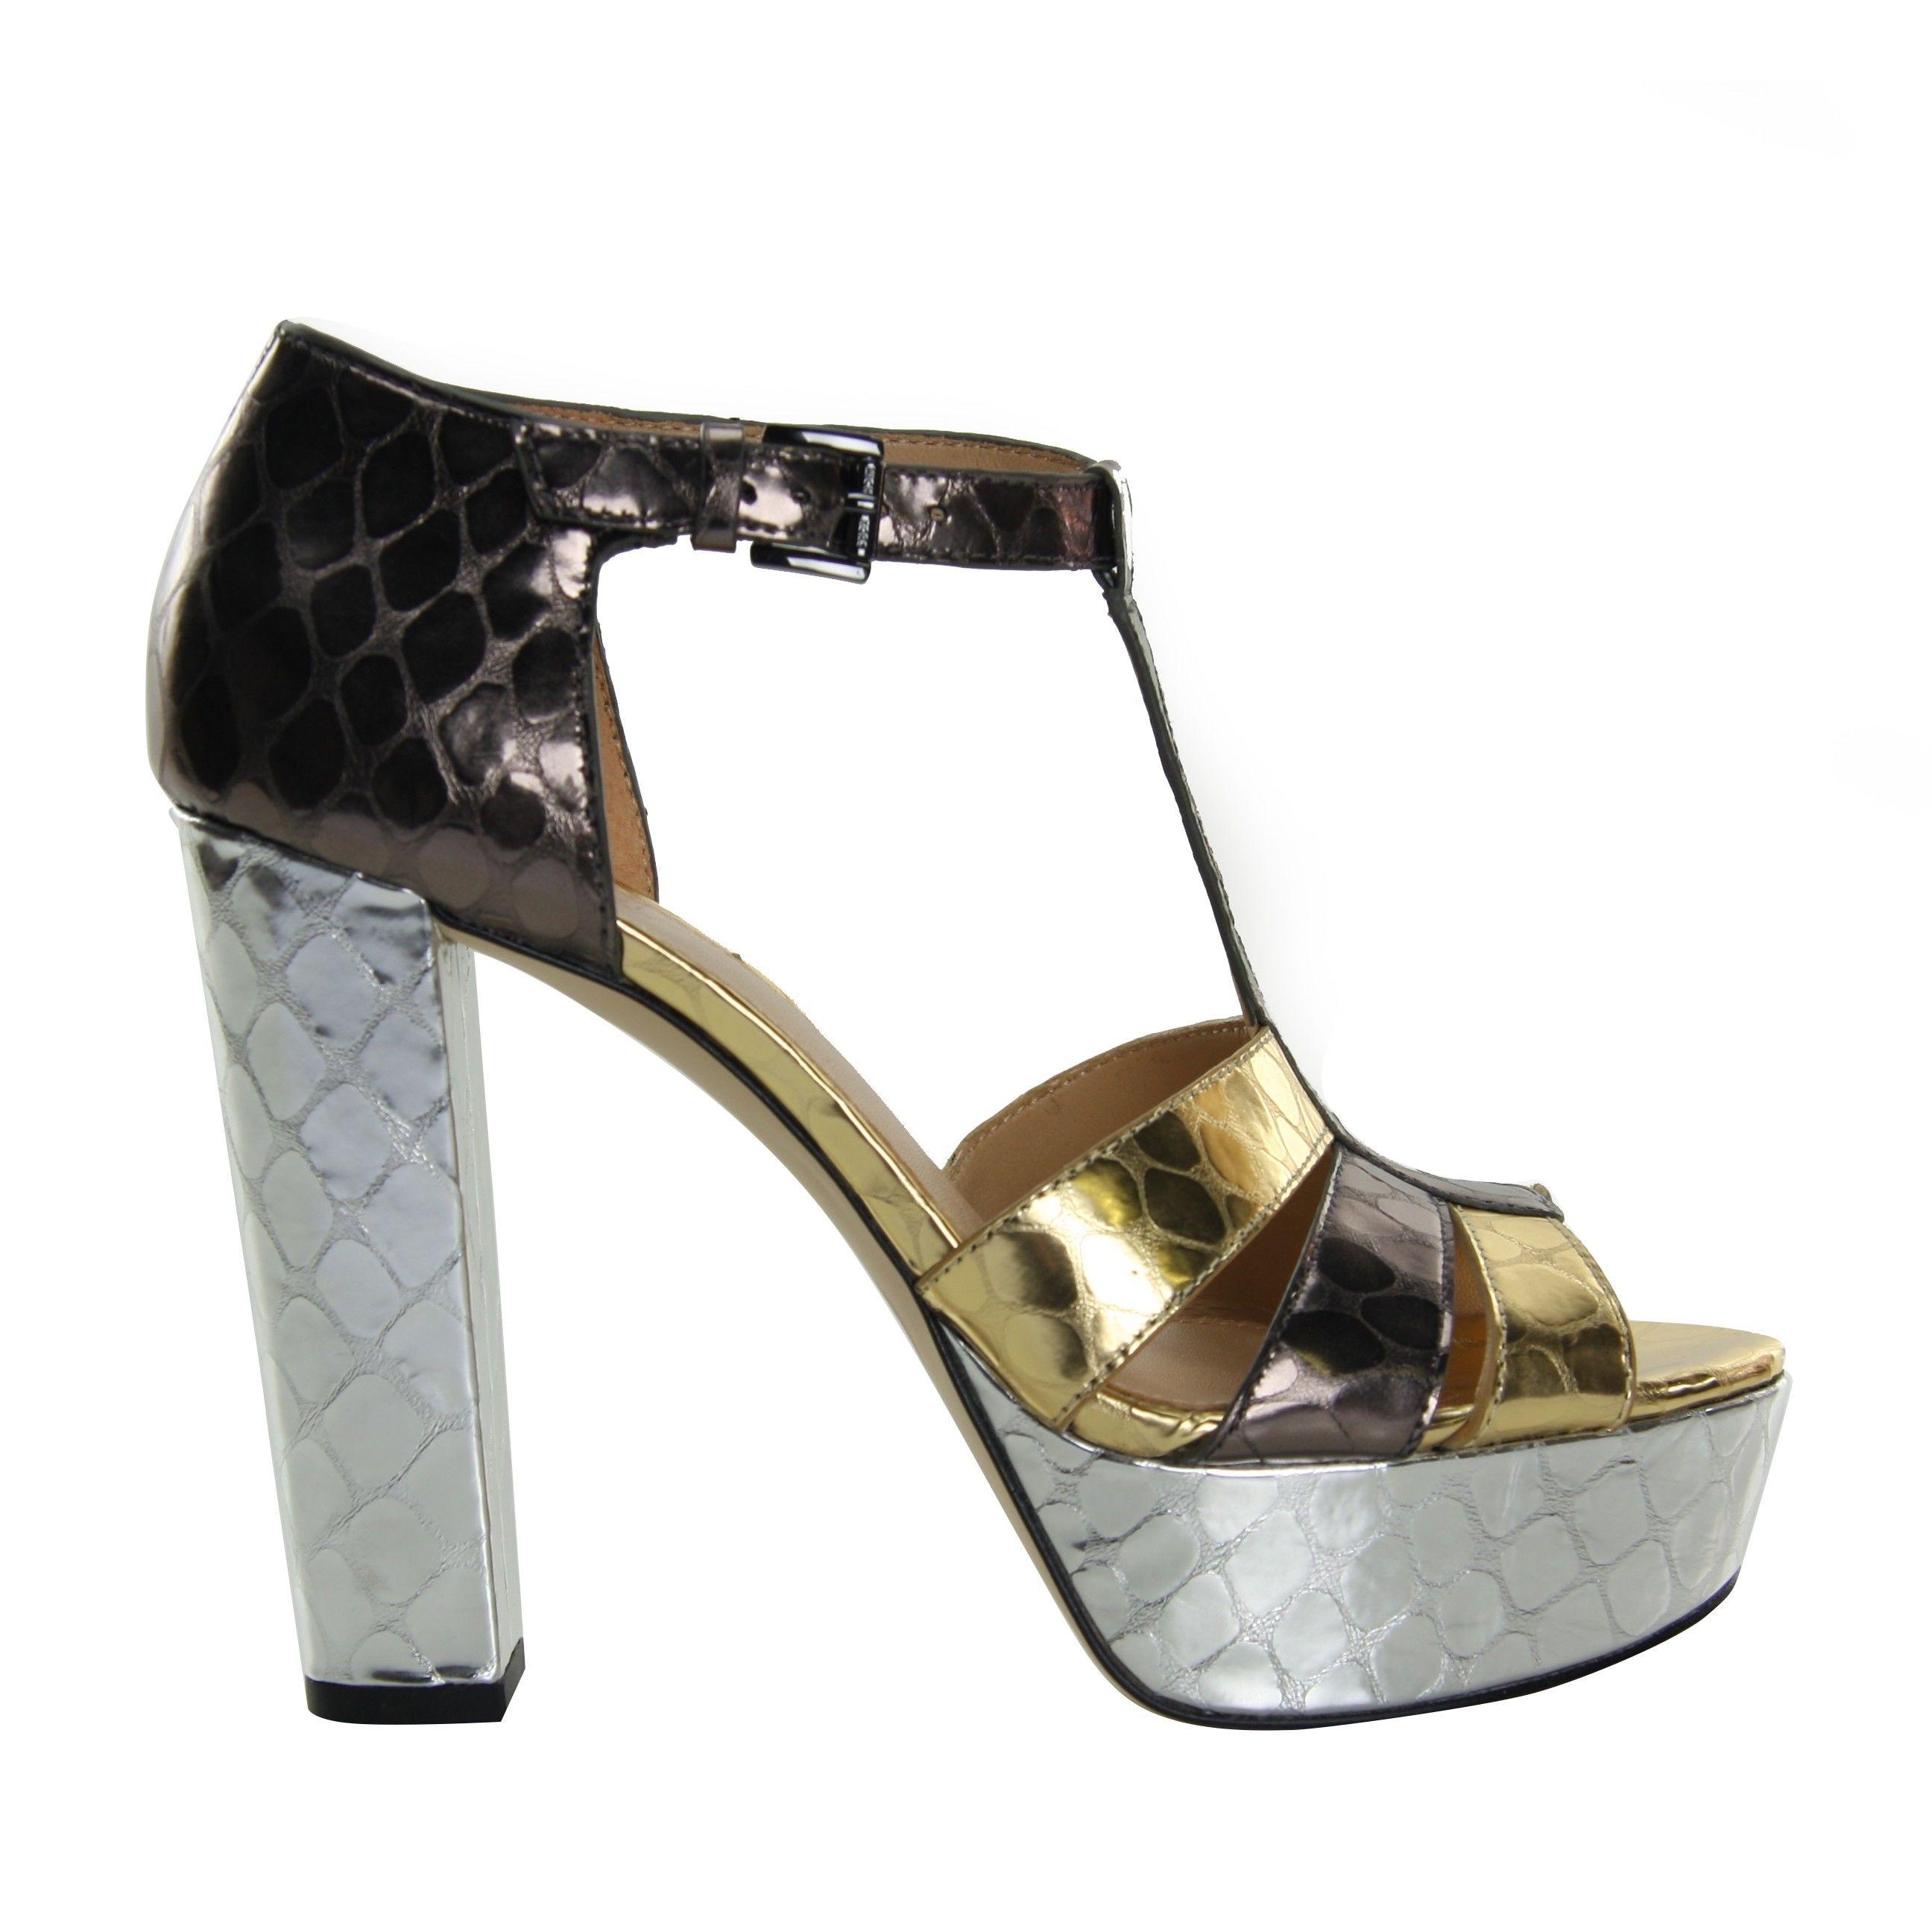 Mercer Platform Sandals Michael Michael Kors Metallic